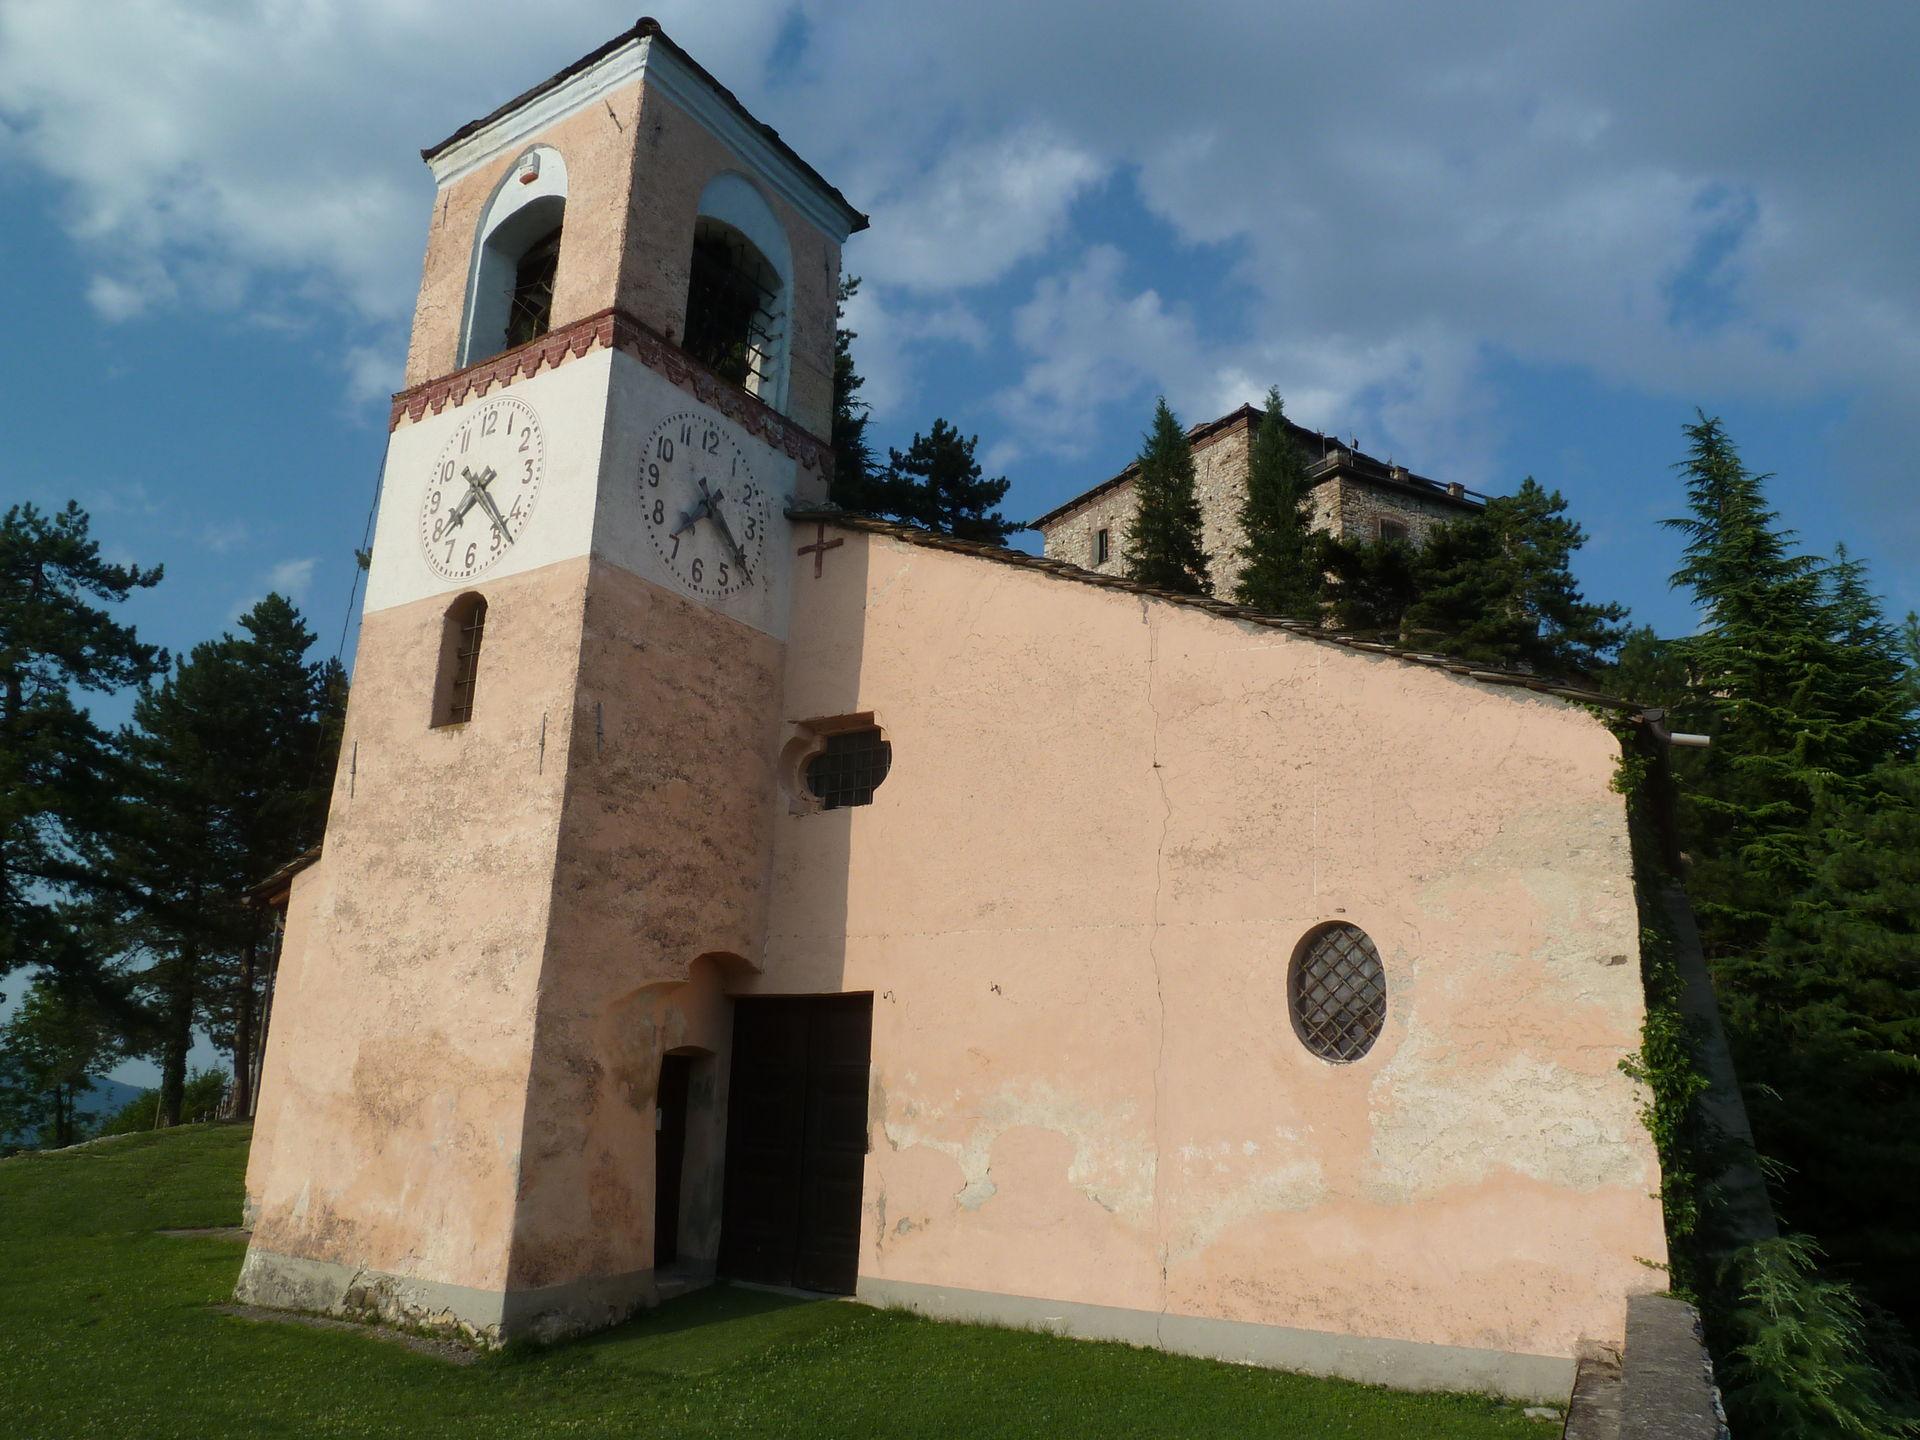 La Guida - Montemale celebra San Michele Arcangelo